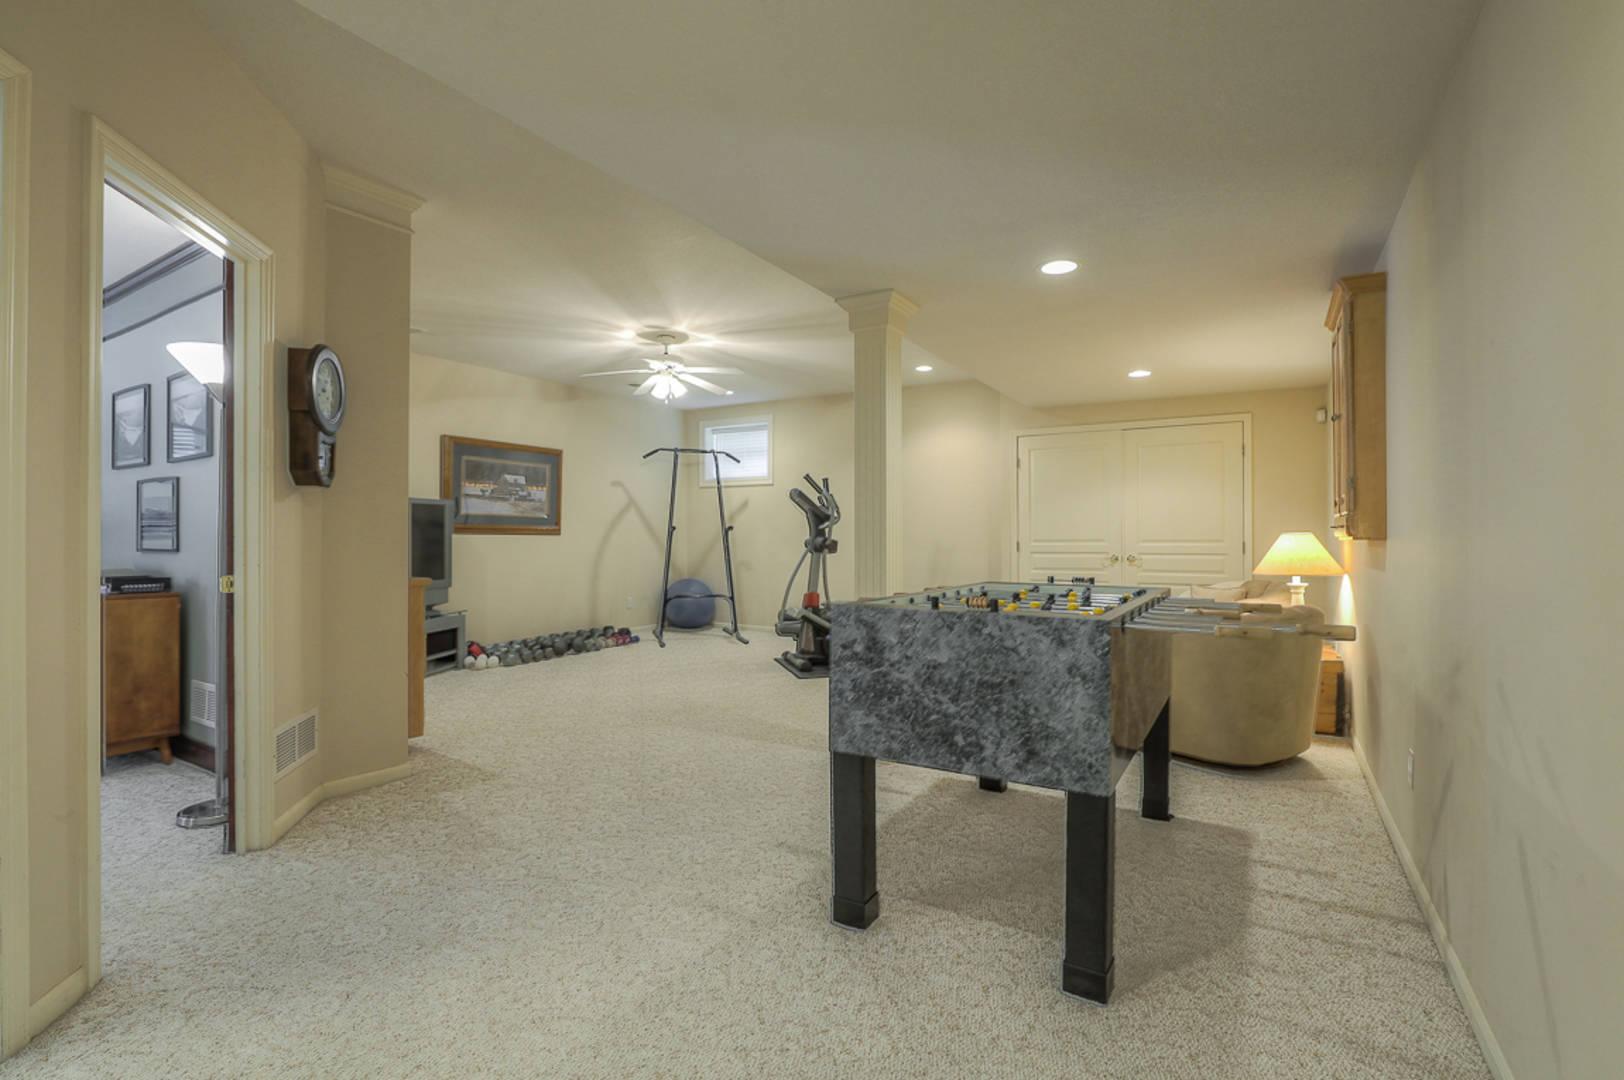 11927 West 132nd Terrace Overland Park, KS 66213